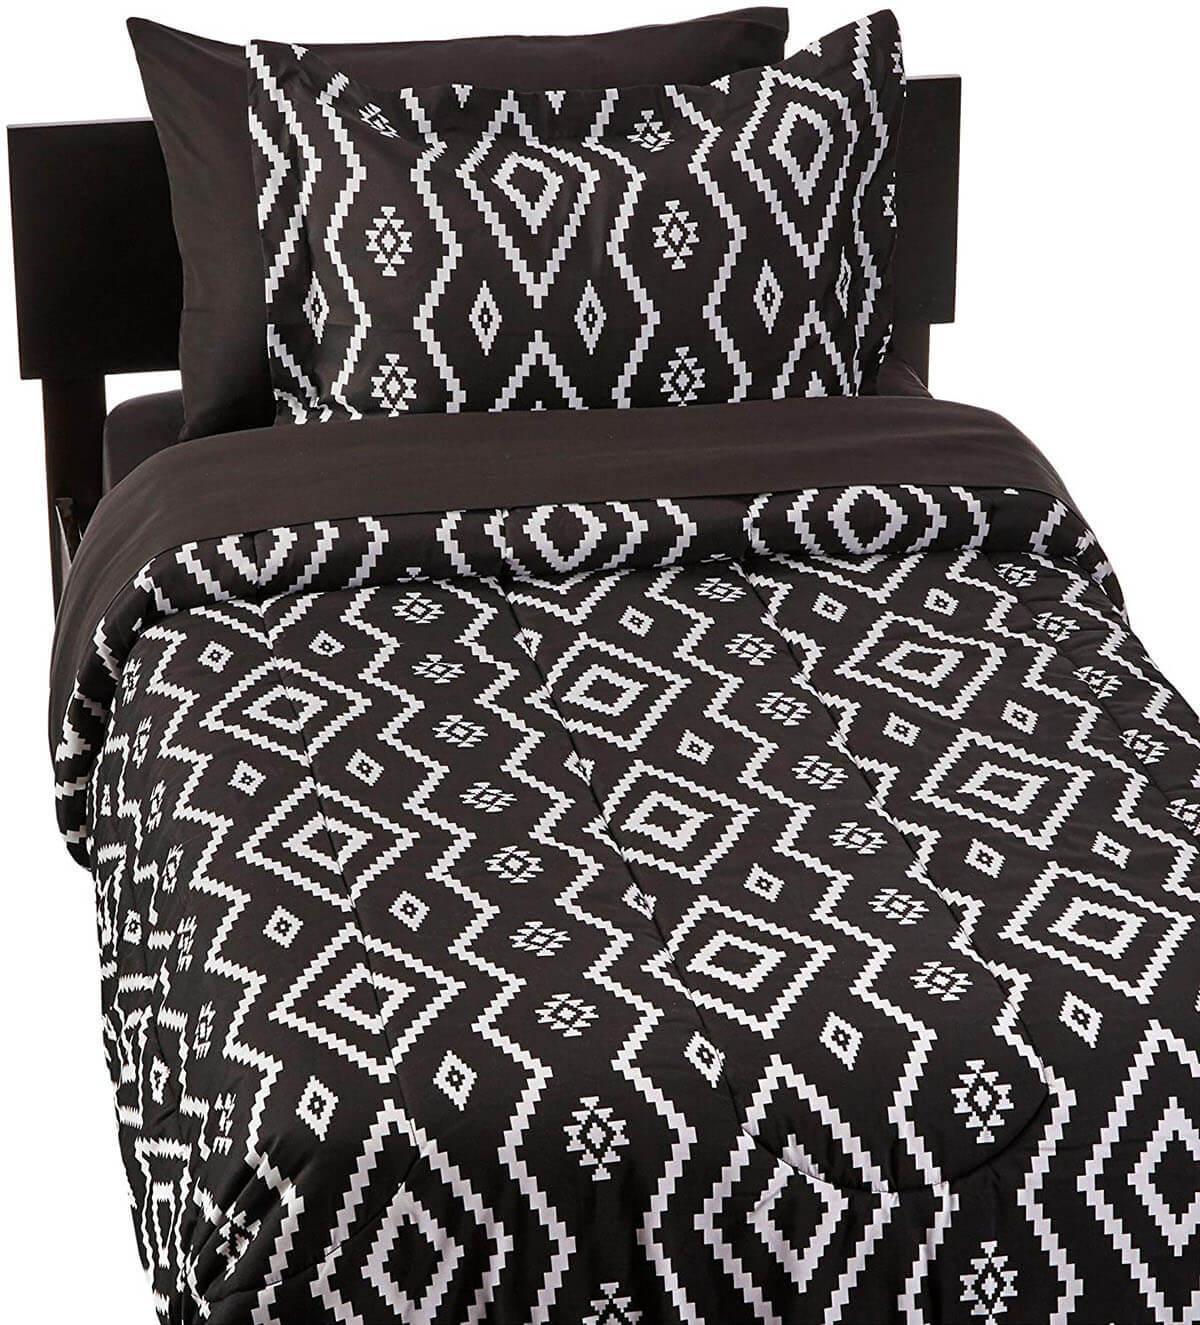 Navajo-Inspired Black and White Bedding